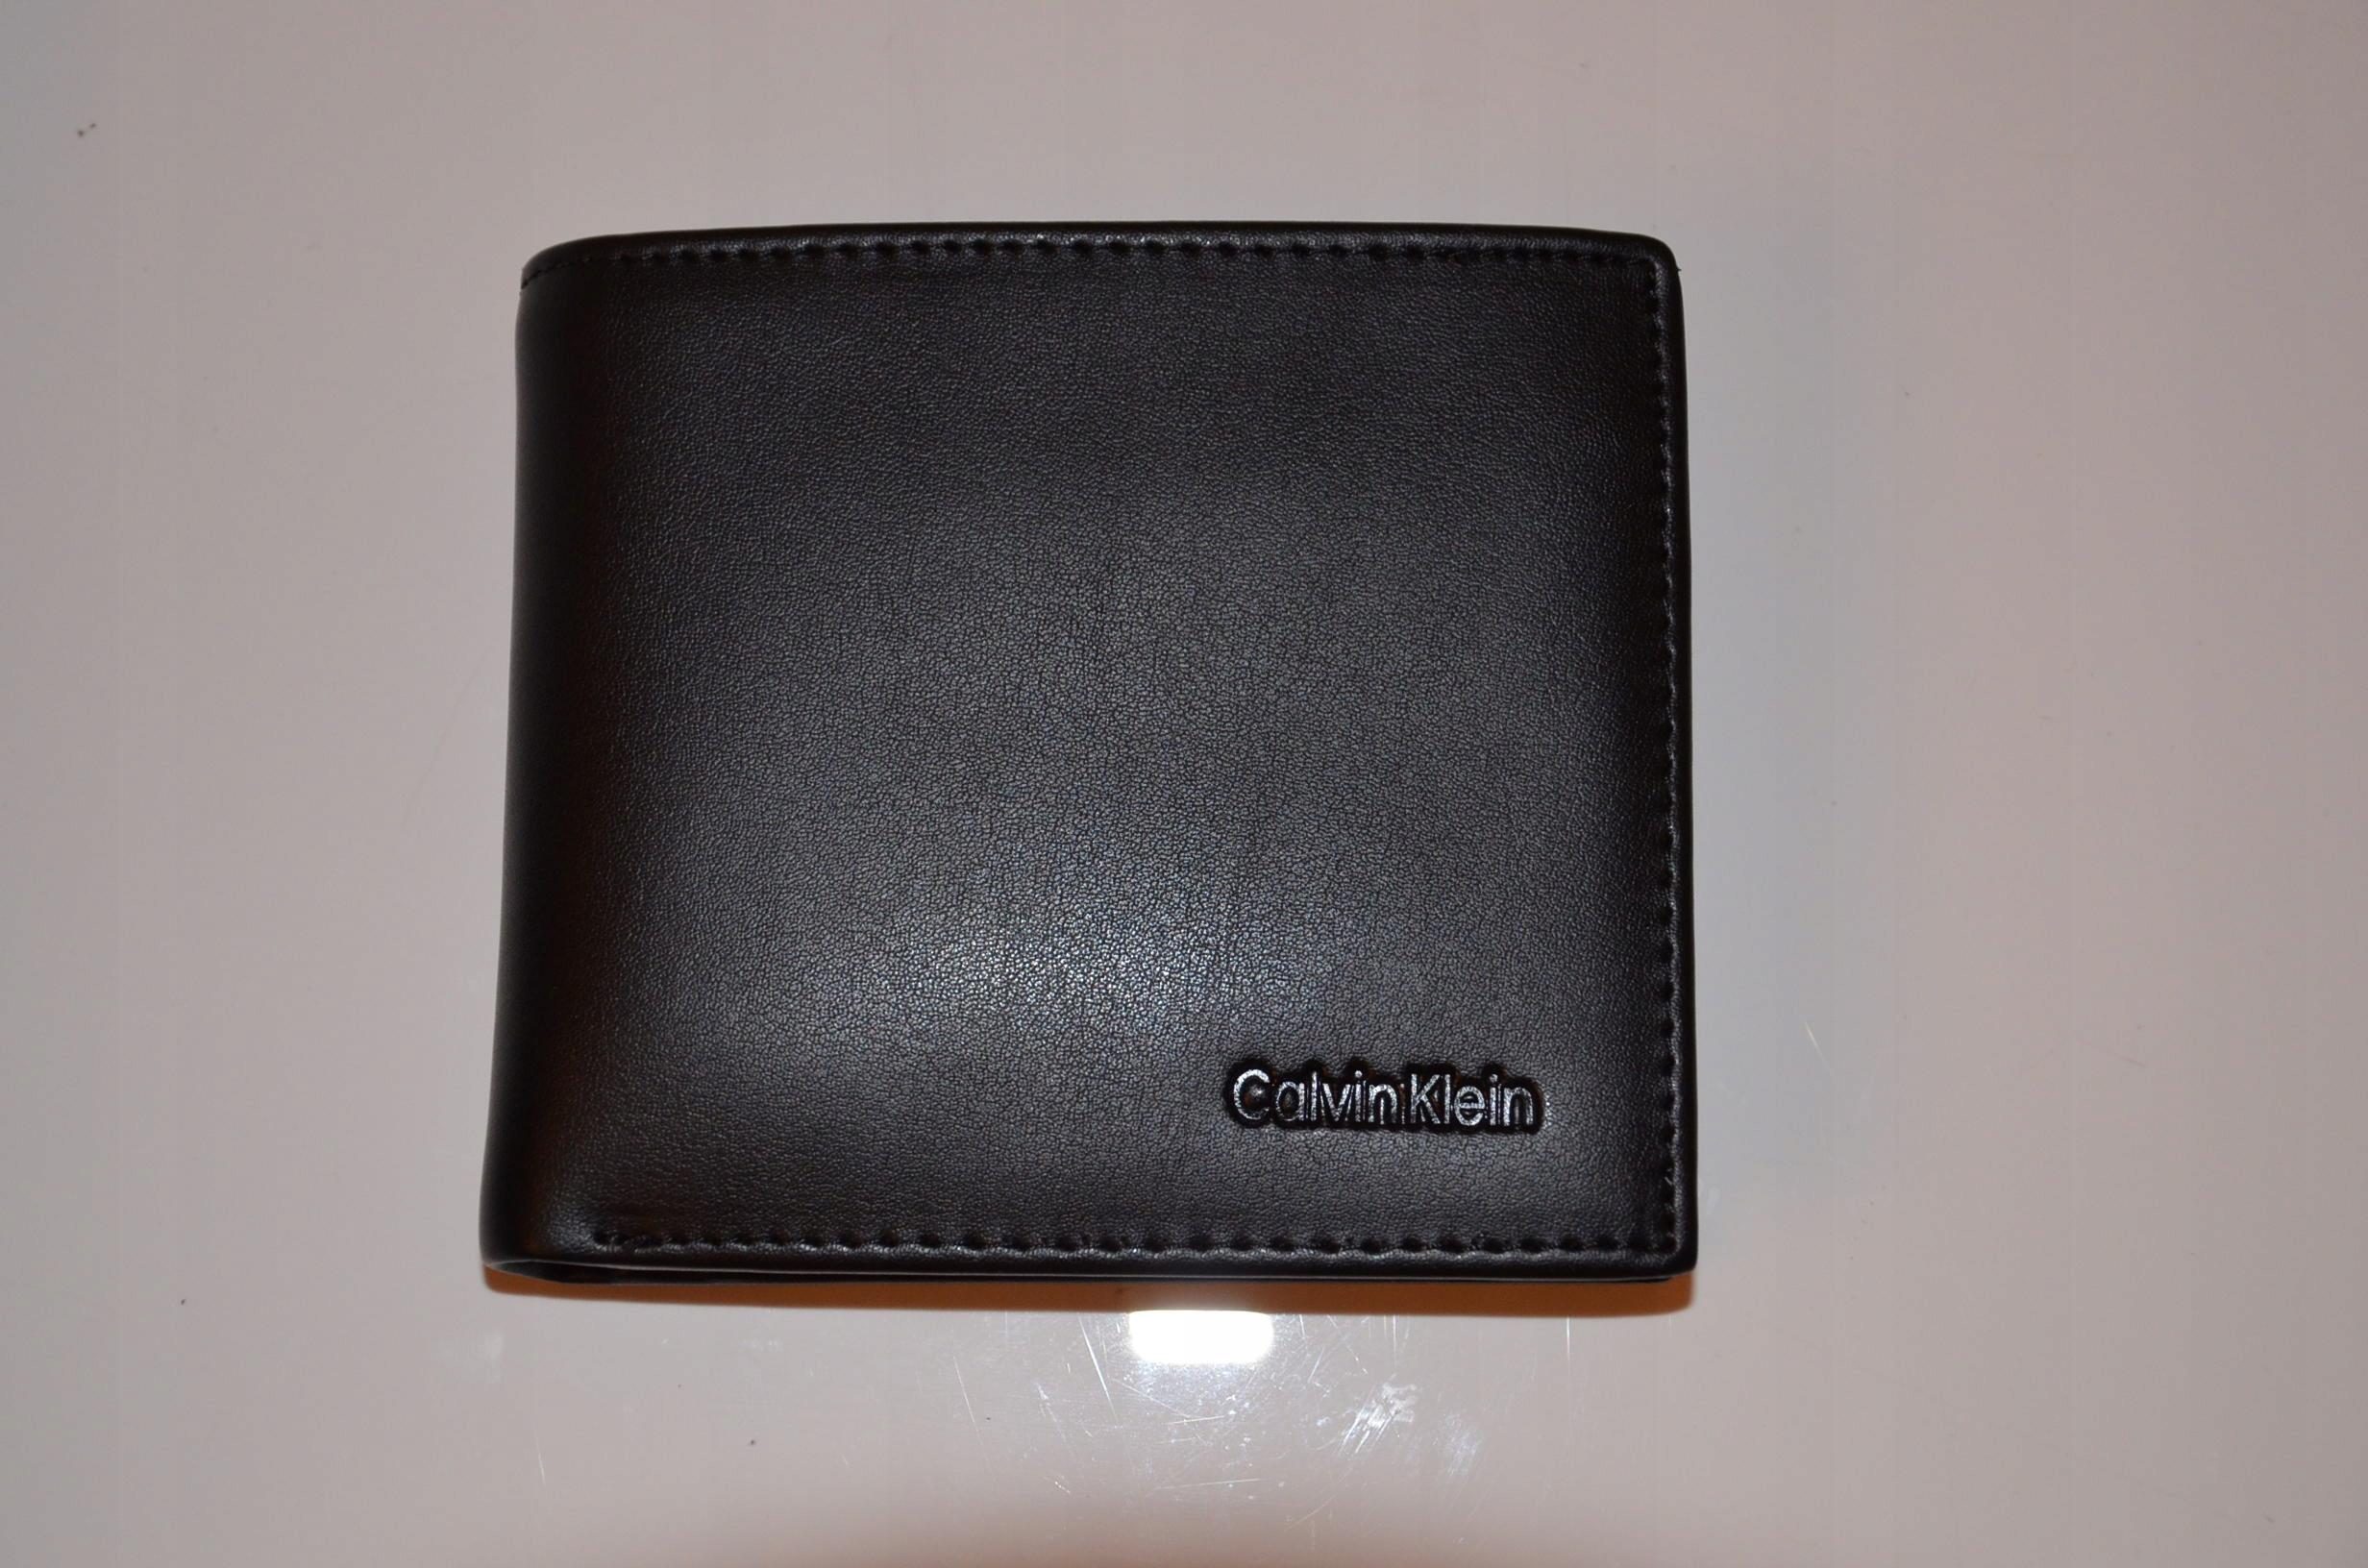 61c1235c8c4fe Męski portfel Calvin Klein brelok zestaw NOWYczerń - 7608562860 ...